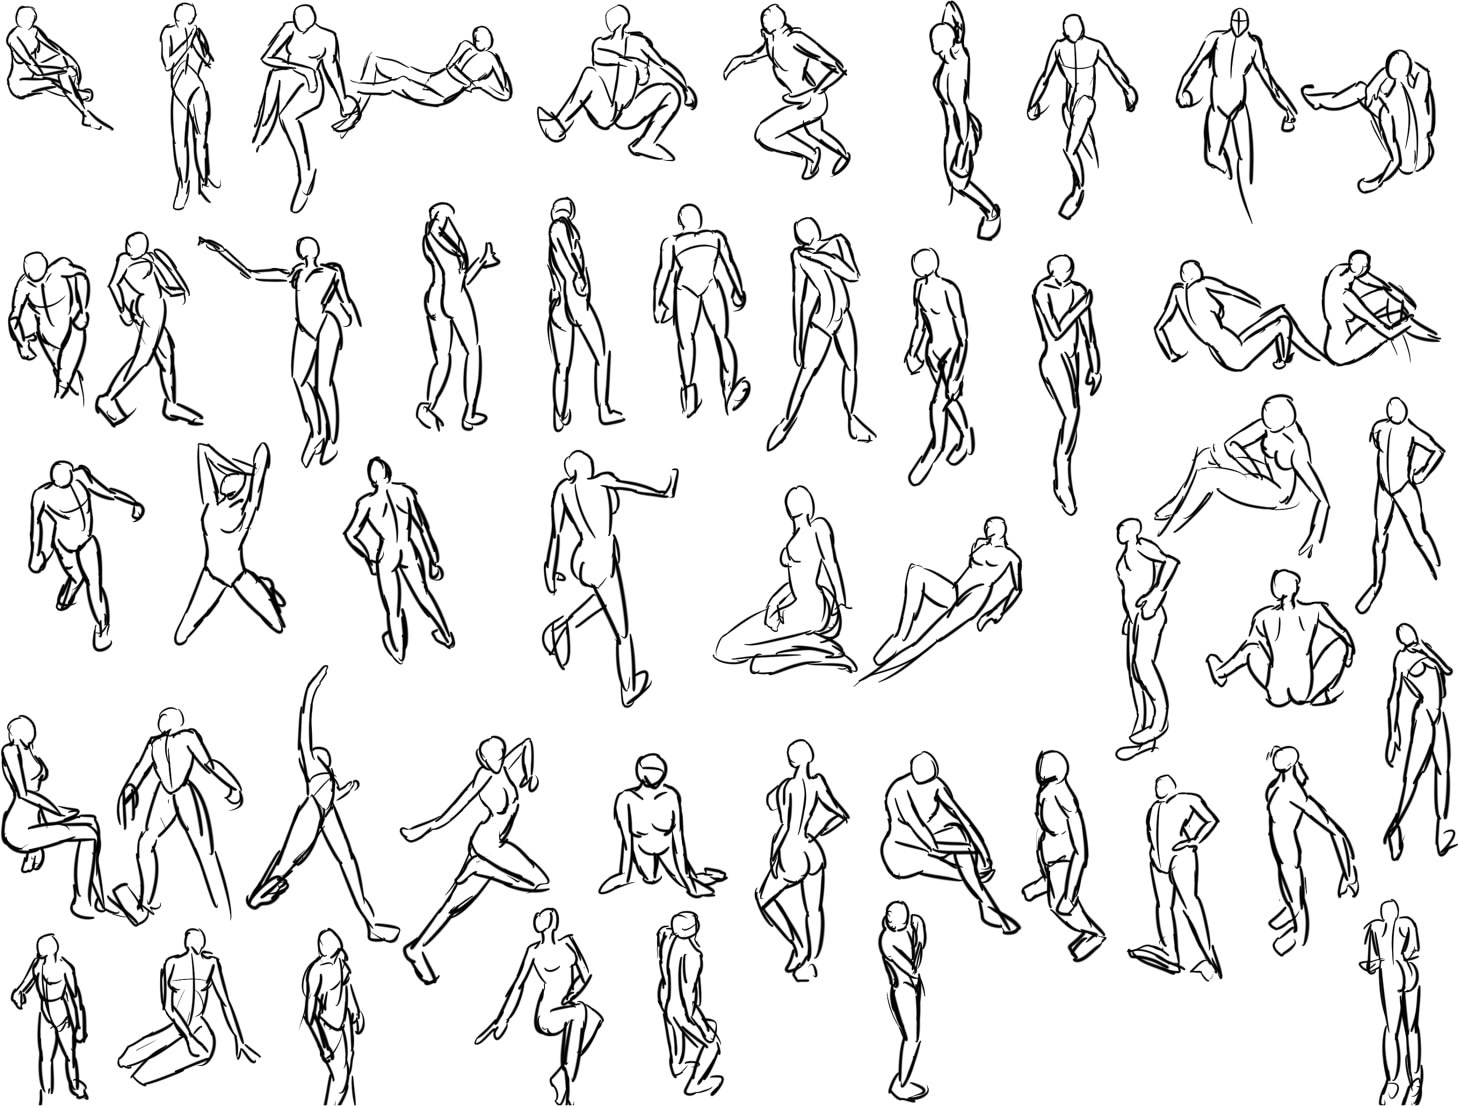 drawing30_05.jpg